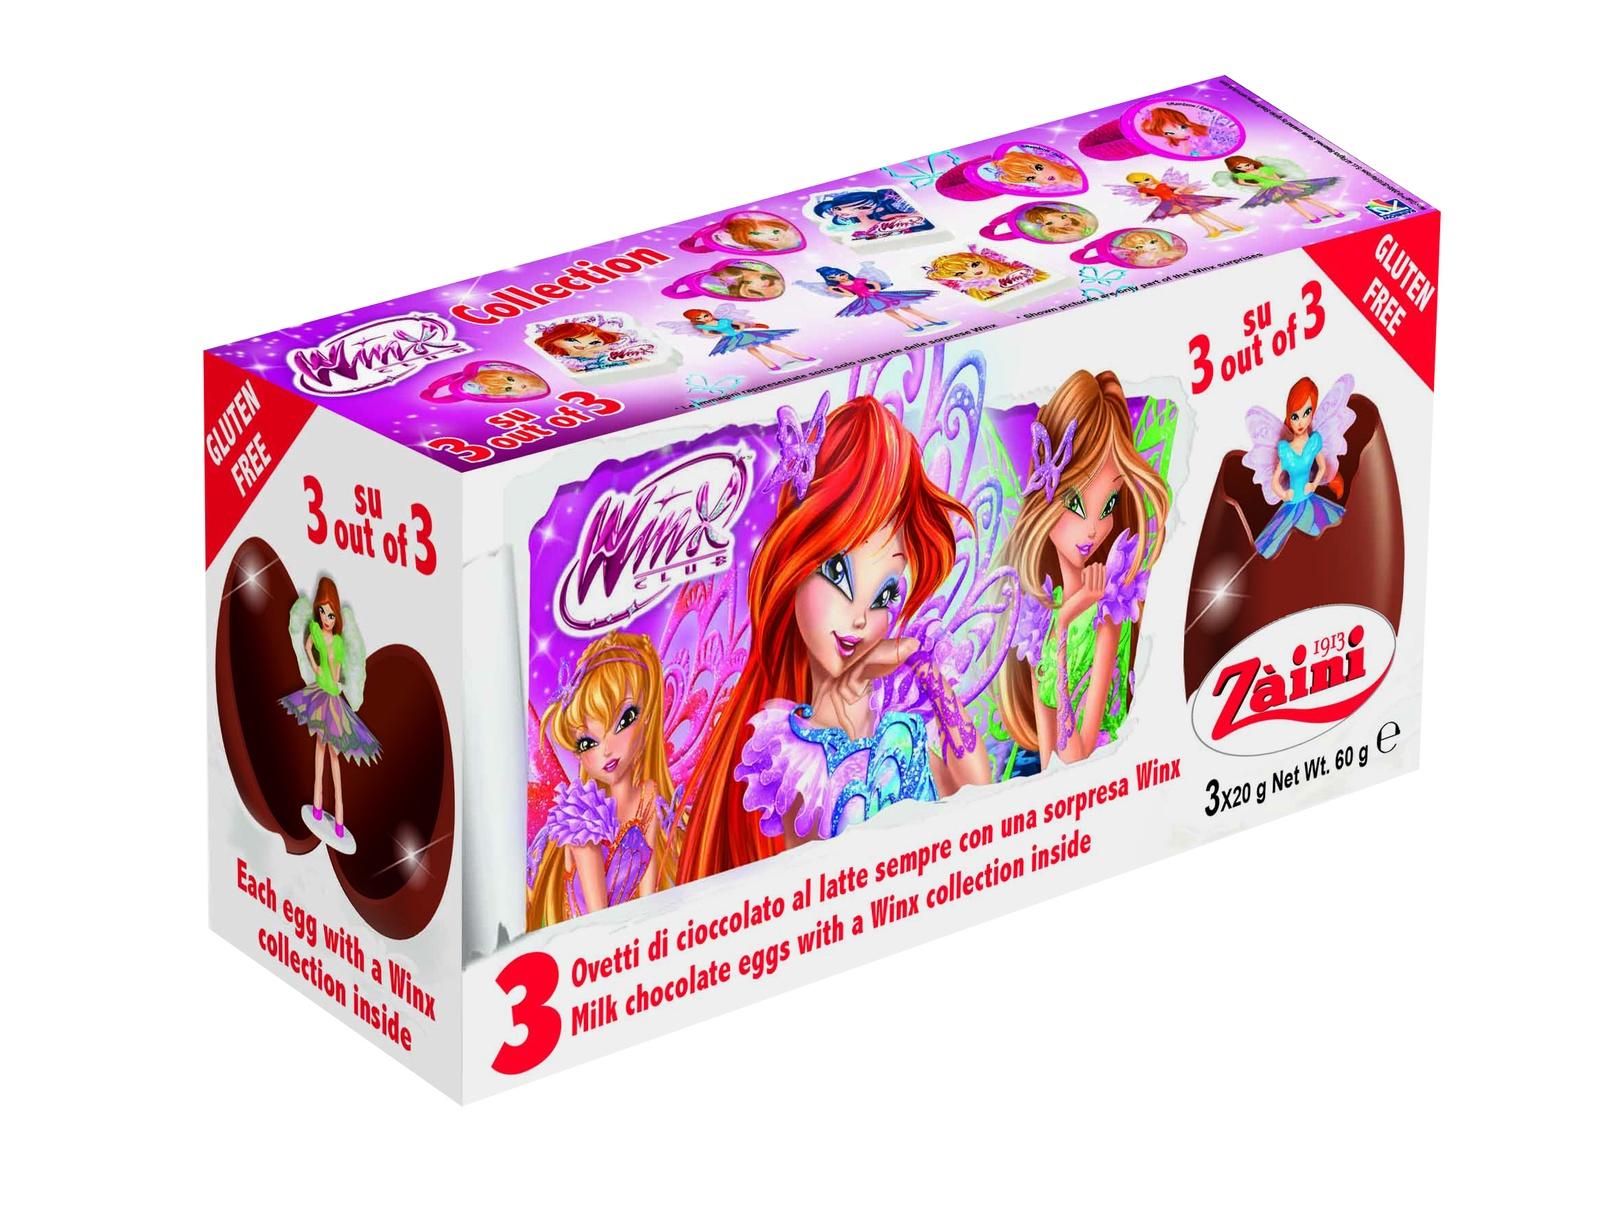 Шоколадное яйцо ZAINI Шоколадное яйцо WINX с коллекционной игрушкой-сюрпризом внутри Zaini(WINX) tpk, Молочно-шоколадный zaini choco